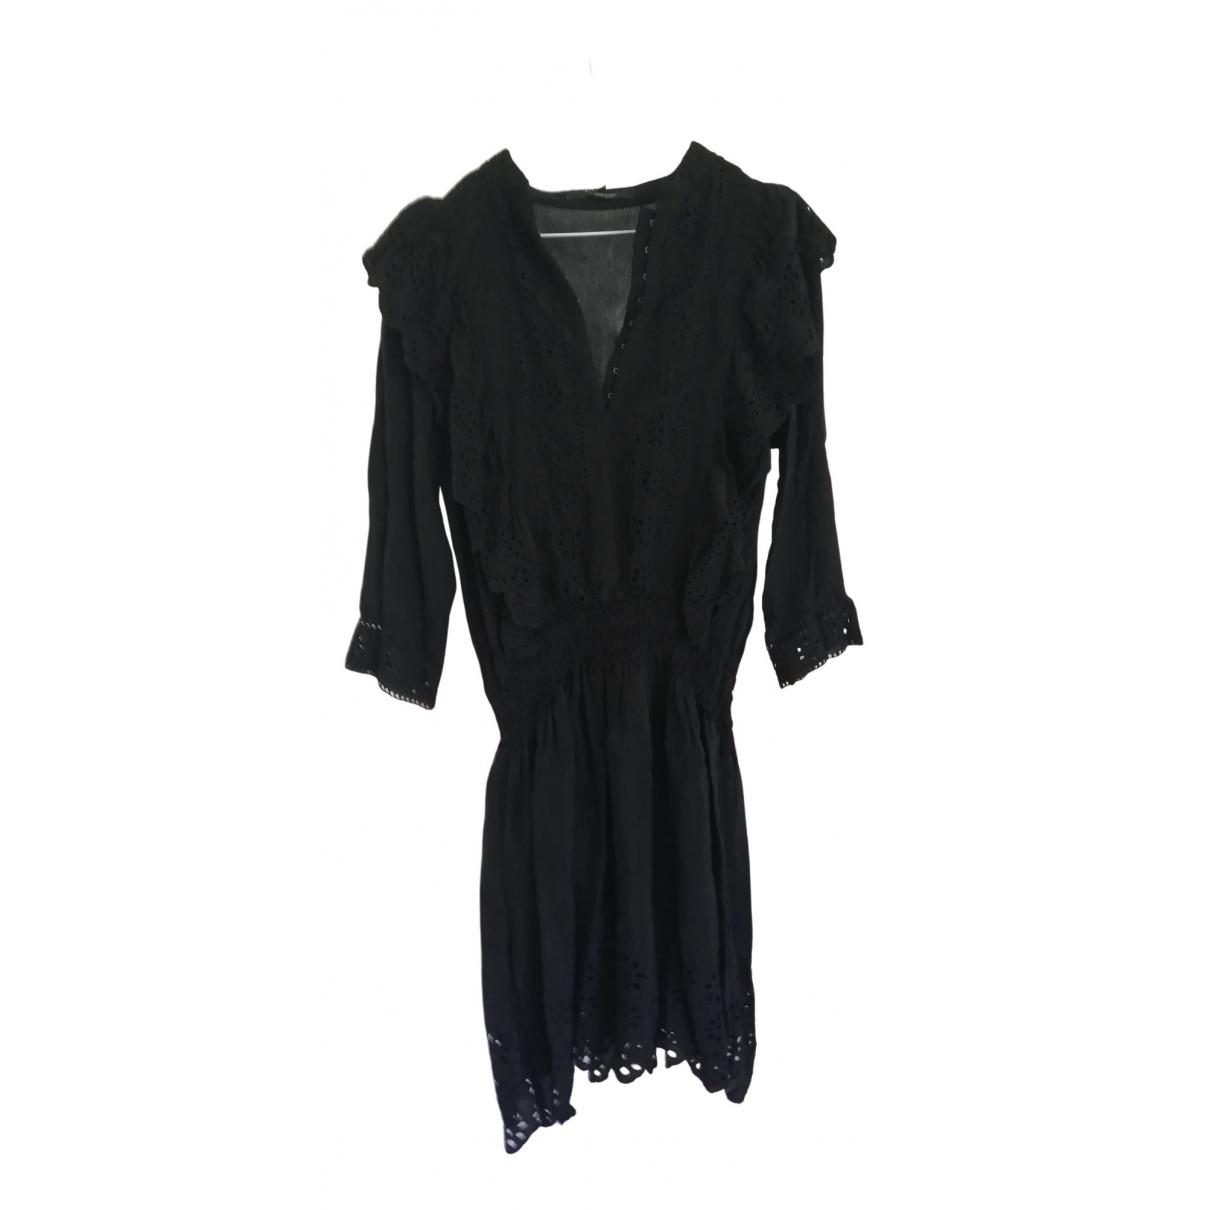 Scotch & Soda \N Kleid in  Schwarz Viskose